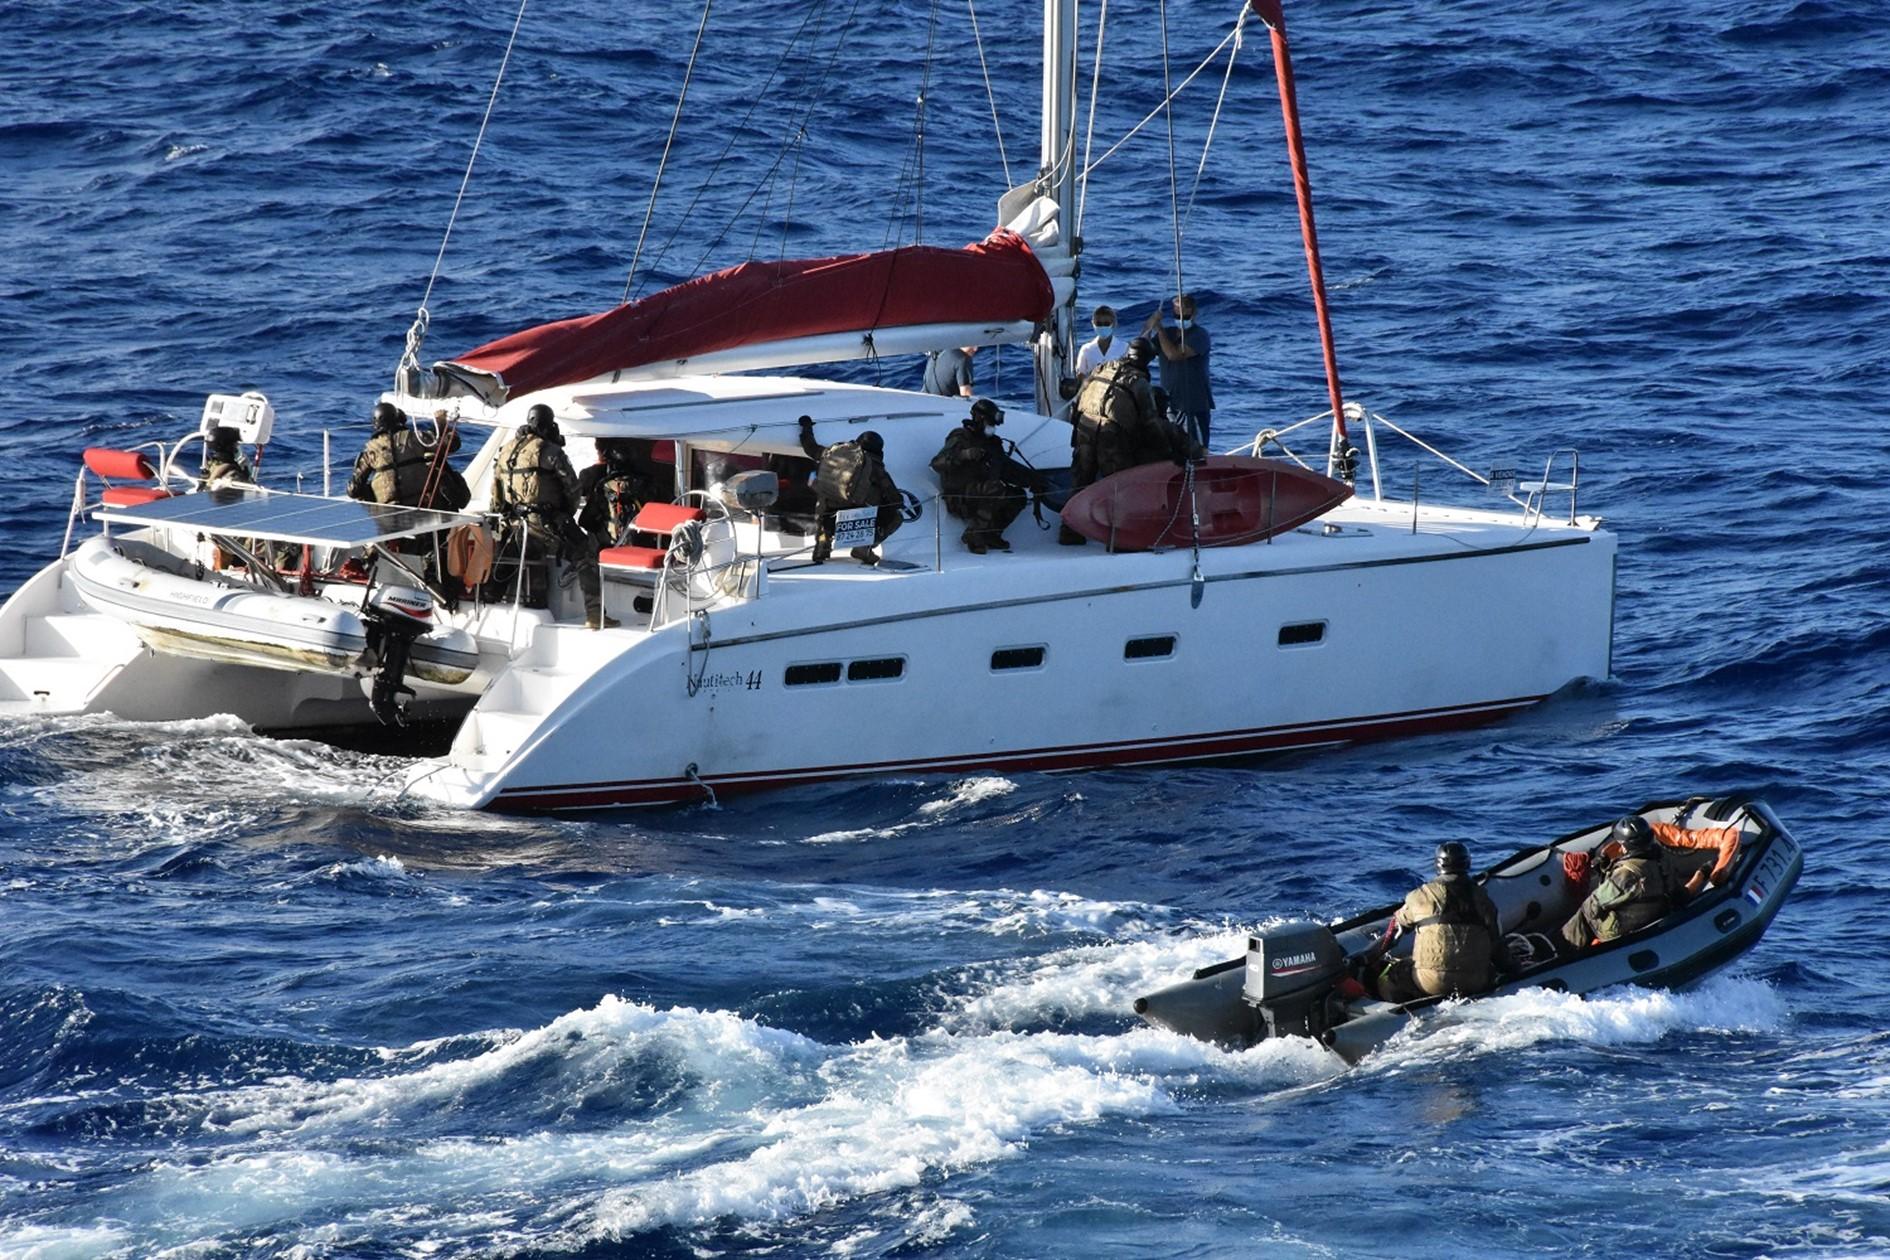 Narcopex, un exercice en mer de lutte contre le narcotrafic